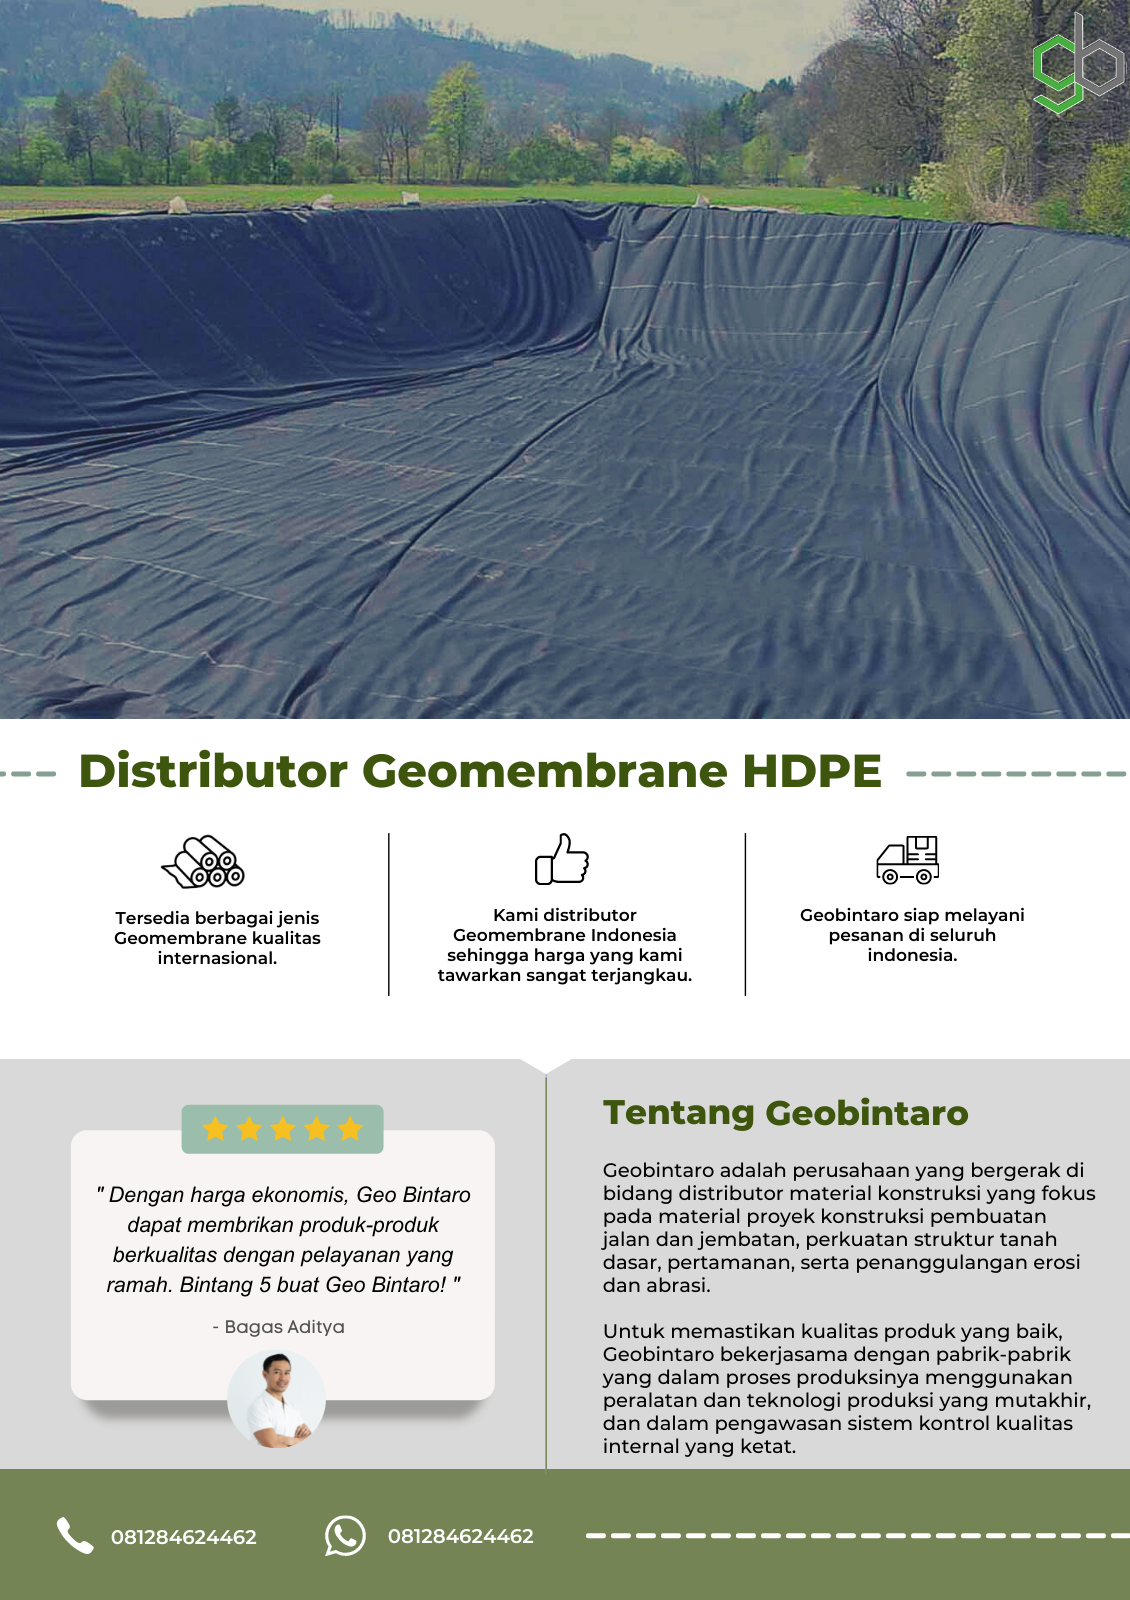 Distributor Geomembrane HDPE